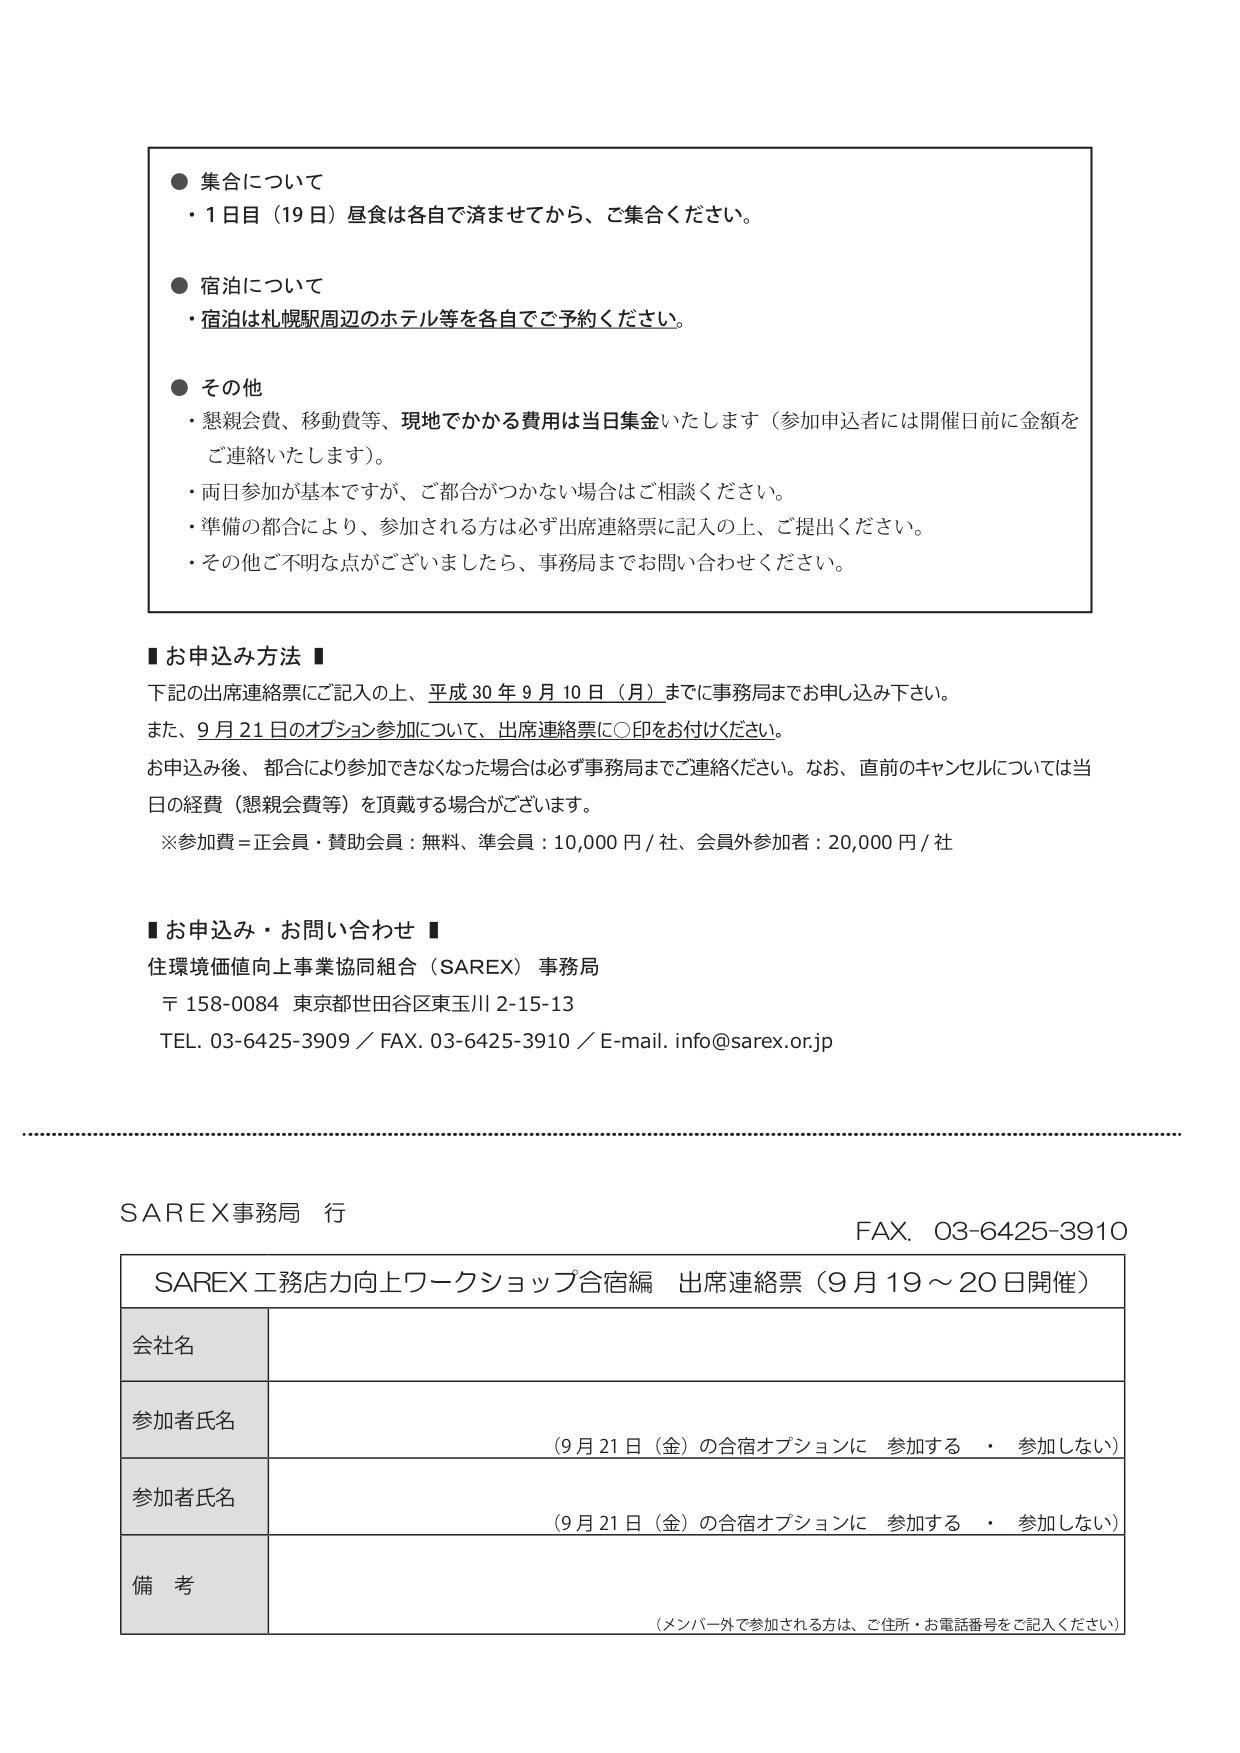 SAREX 北海道に渡る 札幌 ニセコ_e0054299_19132495.jpg